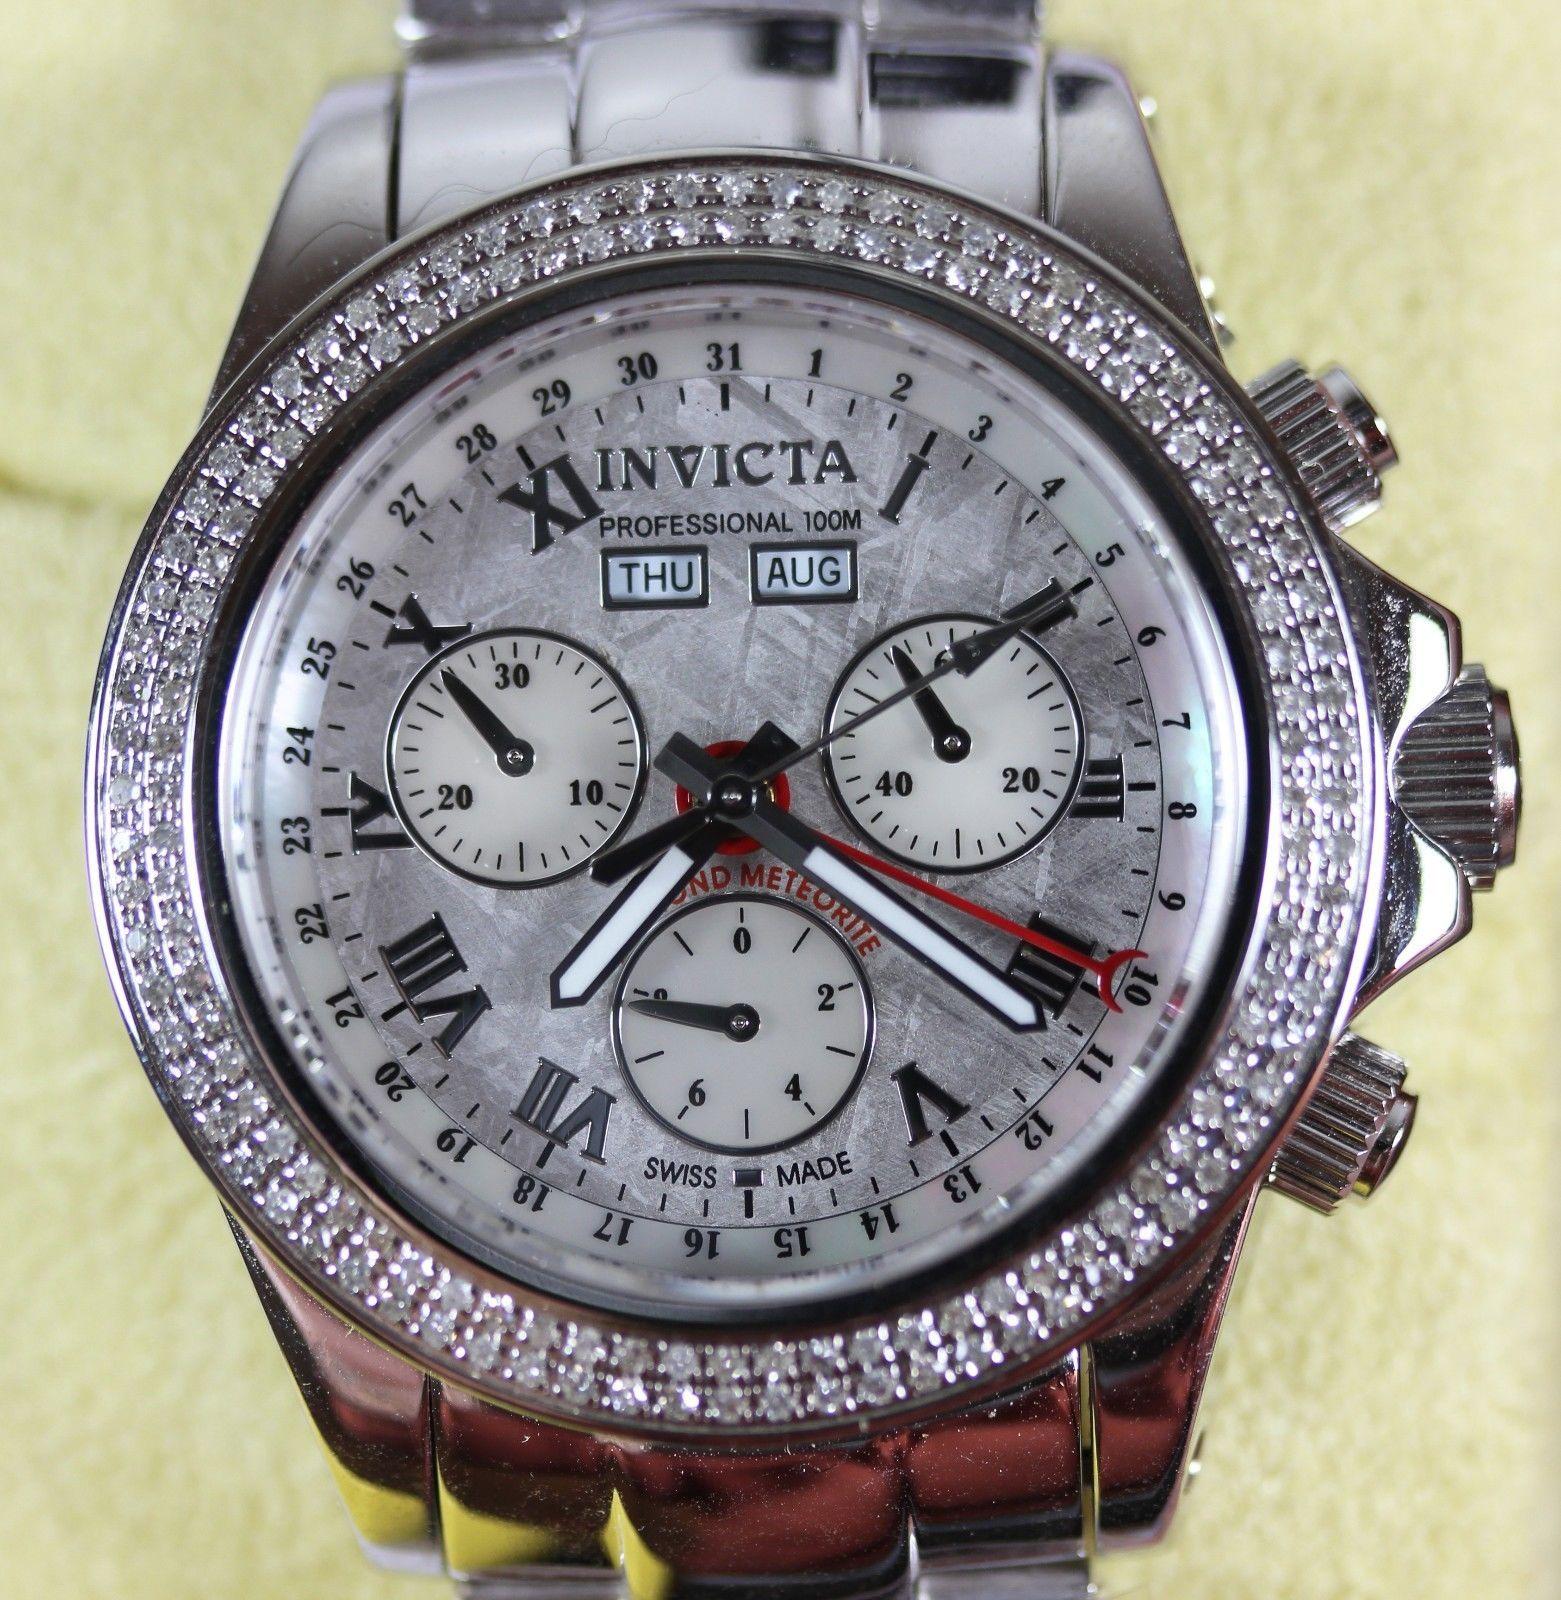 Mens Invicta 2911 Diamond Meteorite 100M Chronograph Wrist Watch - NEW IN BOX https://t.co/FCV1HjKr3g https://t.co/Bym9qKydmU